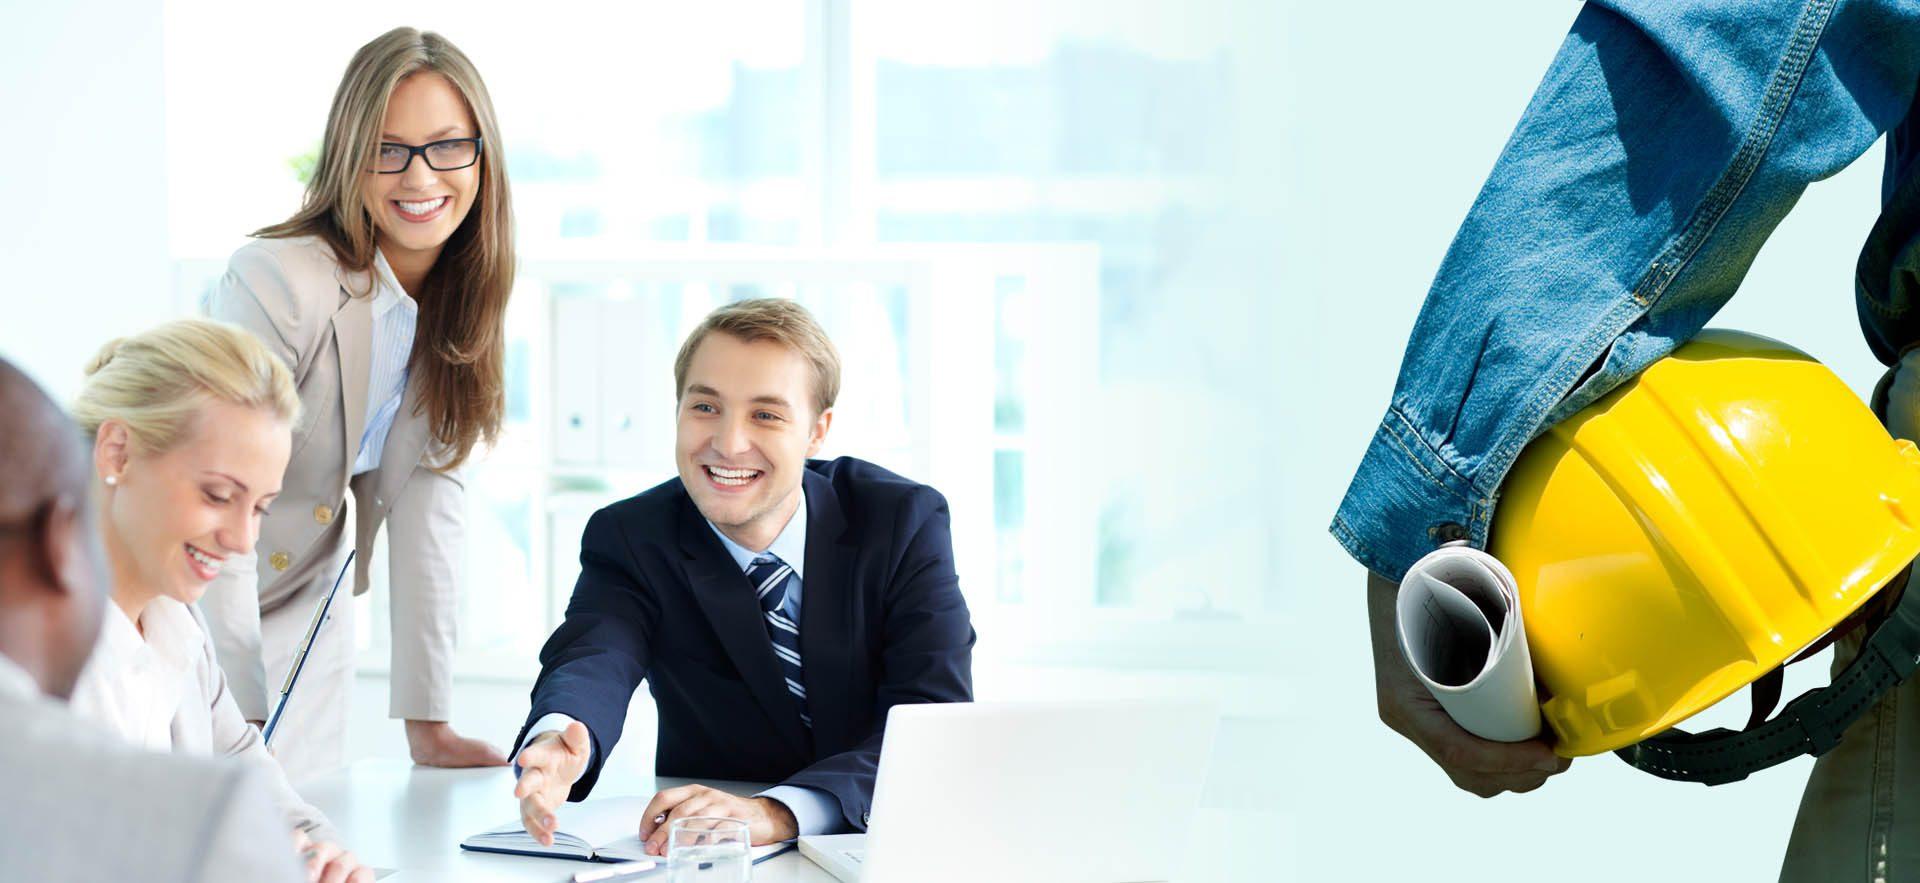 BQJ | Szkolenia BHP, doradztwo, obsługa firm w zakresie BHP - image Slajder-4 on http://bqj.com.pl